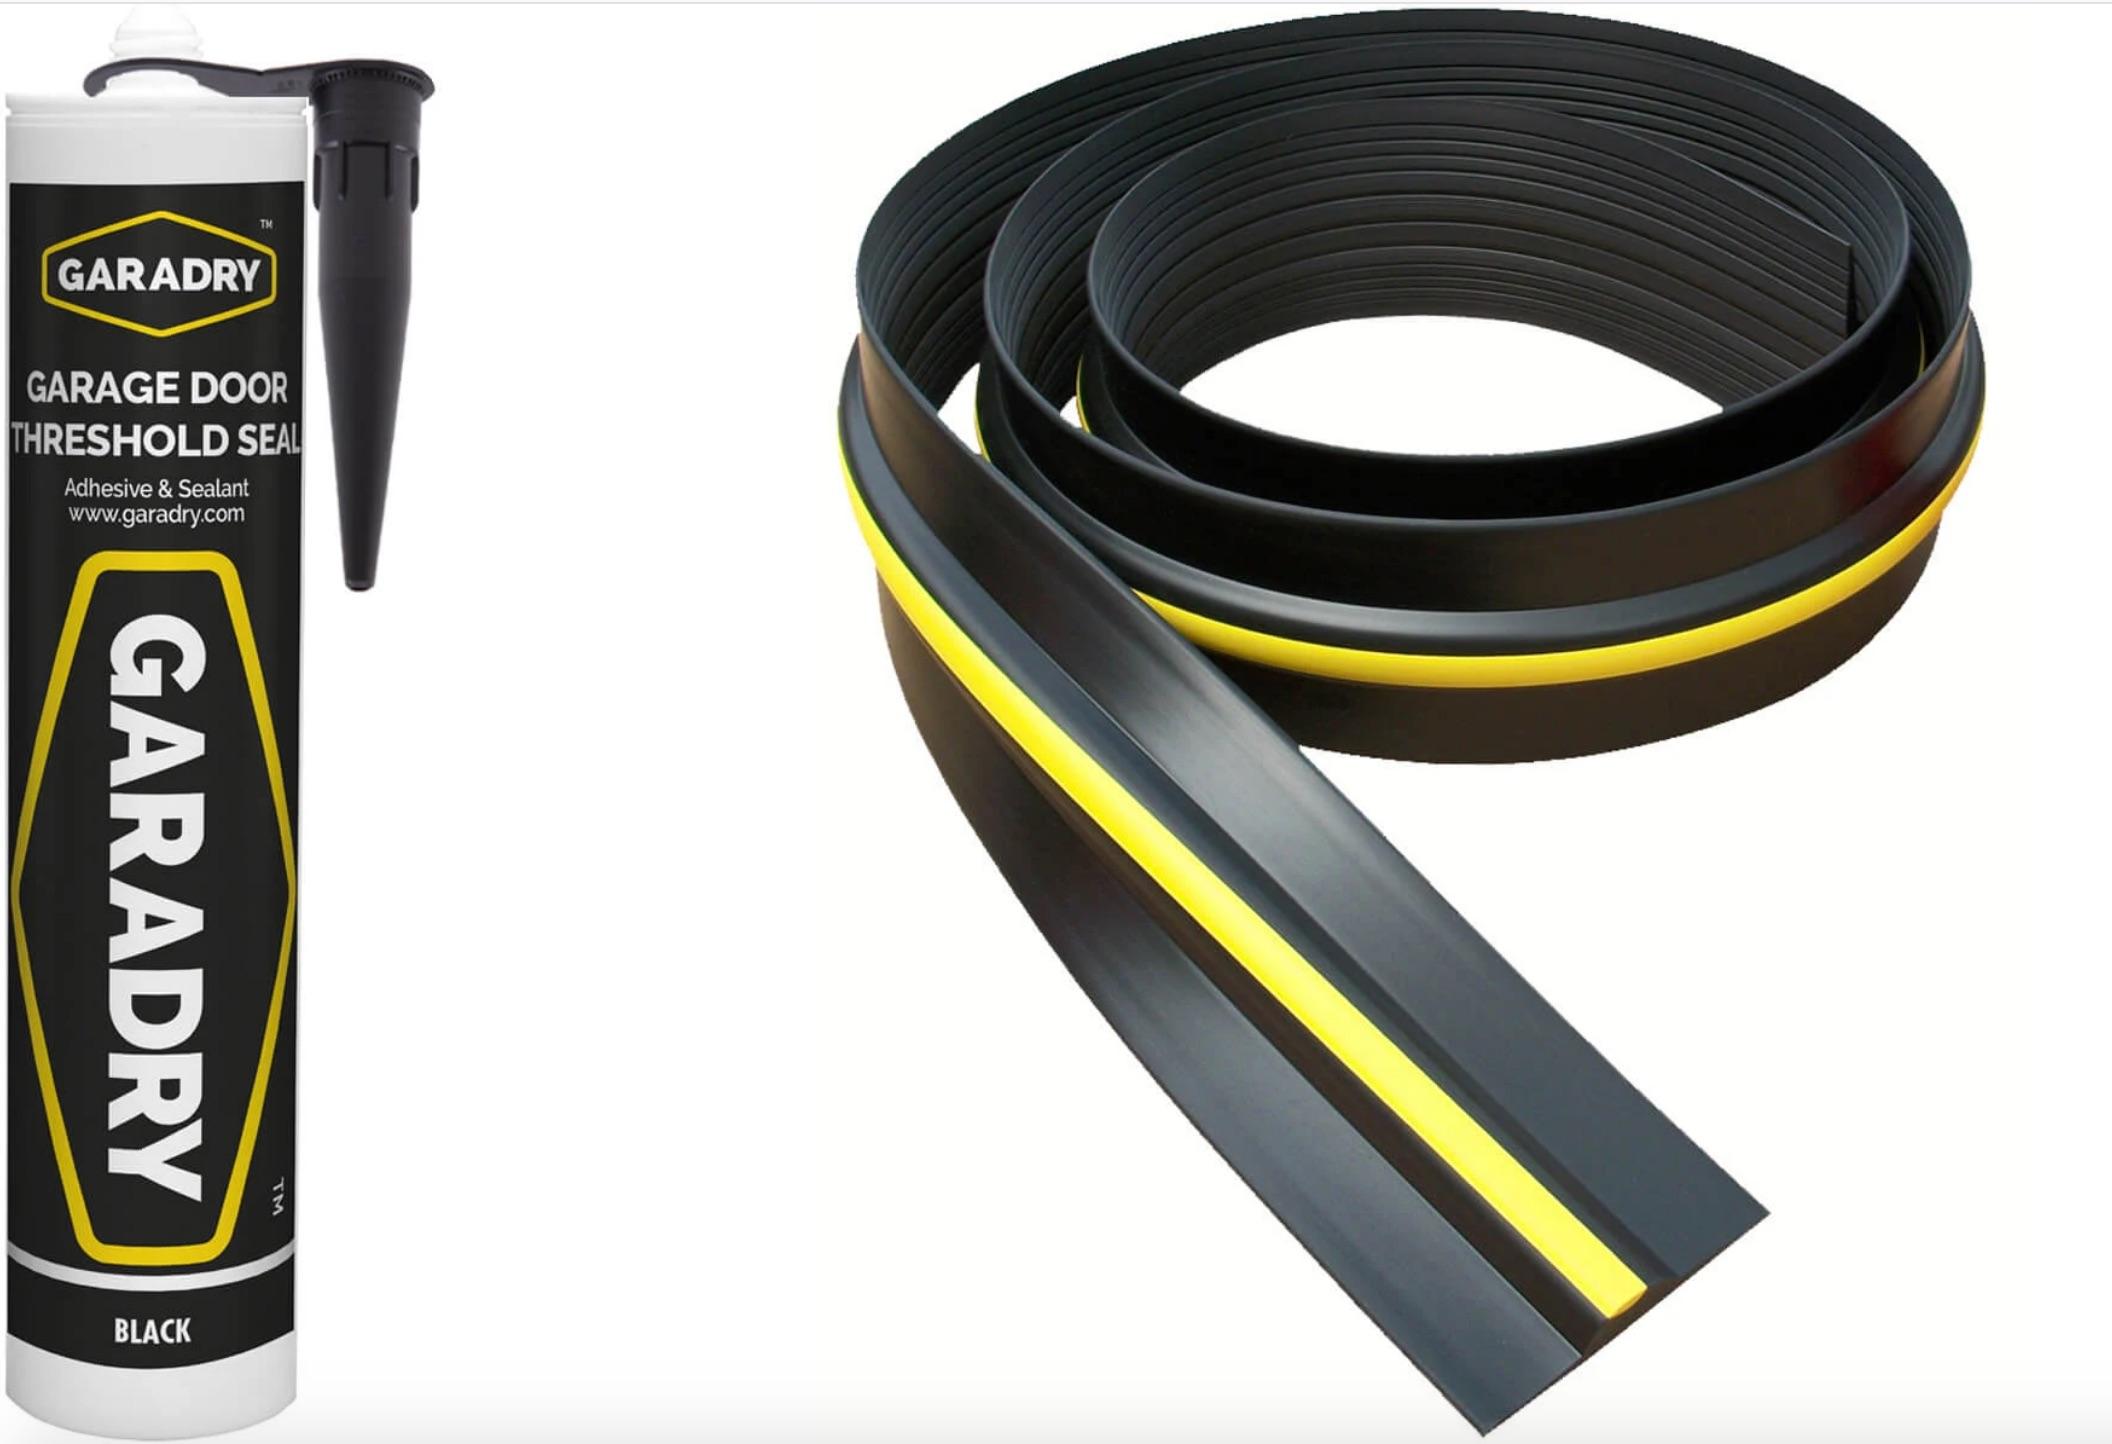 15mm High x 3.12m - 10 foot 3 Long 1 x Adhesive